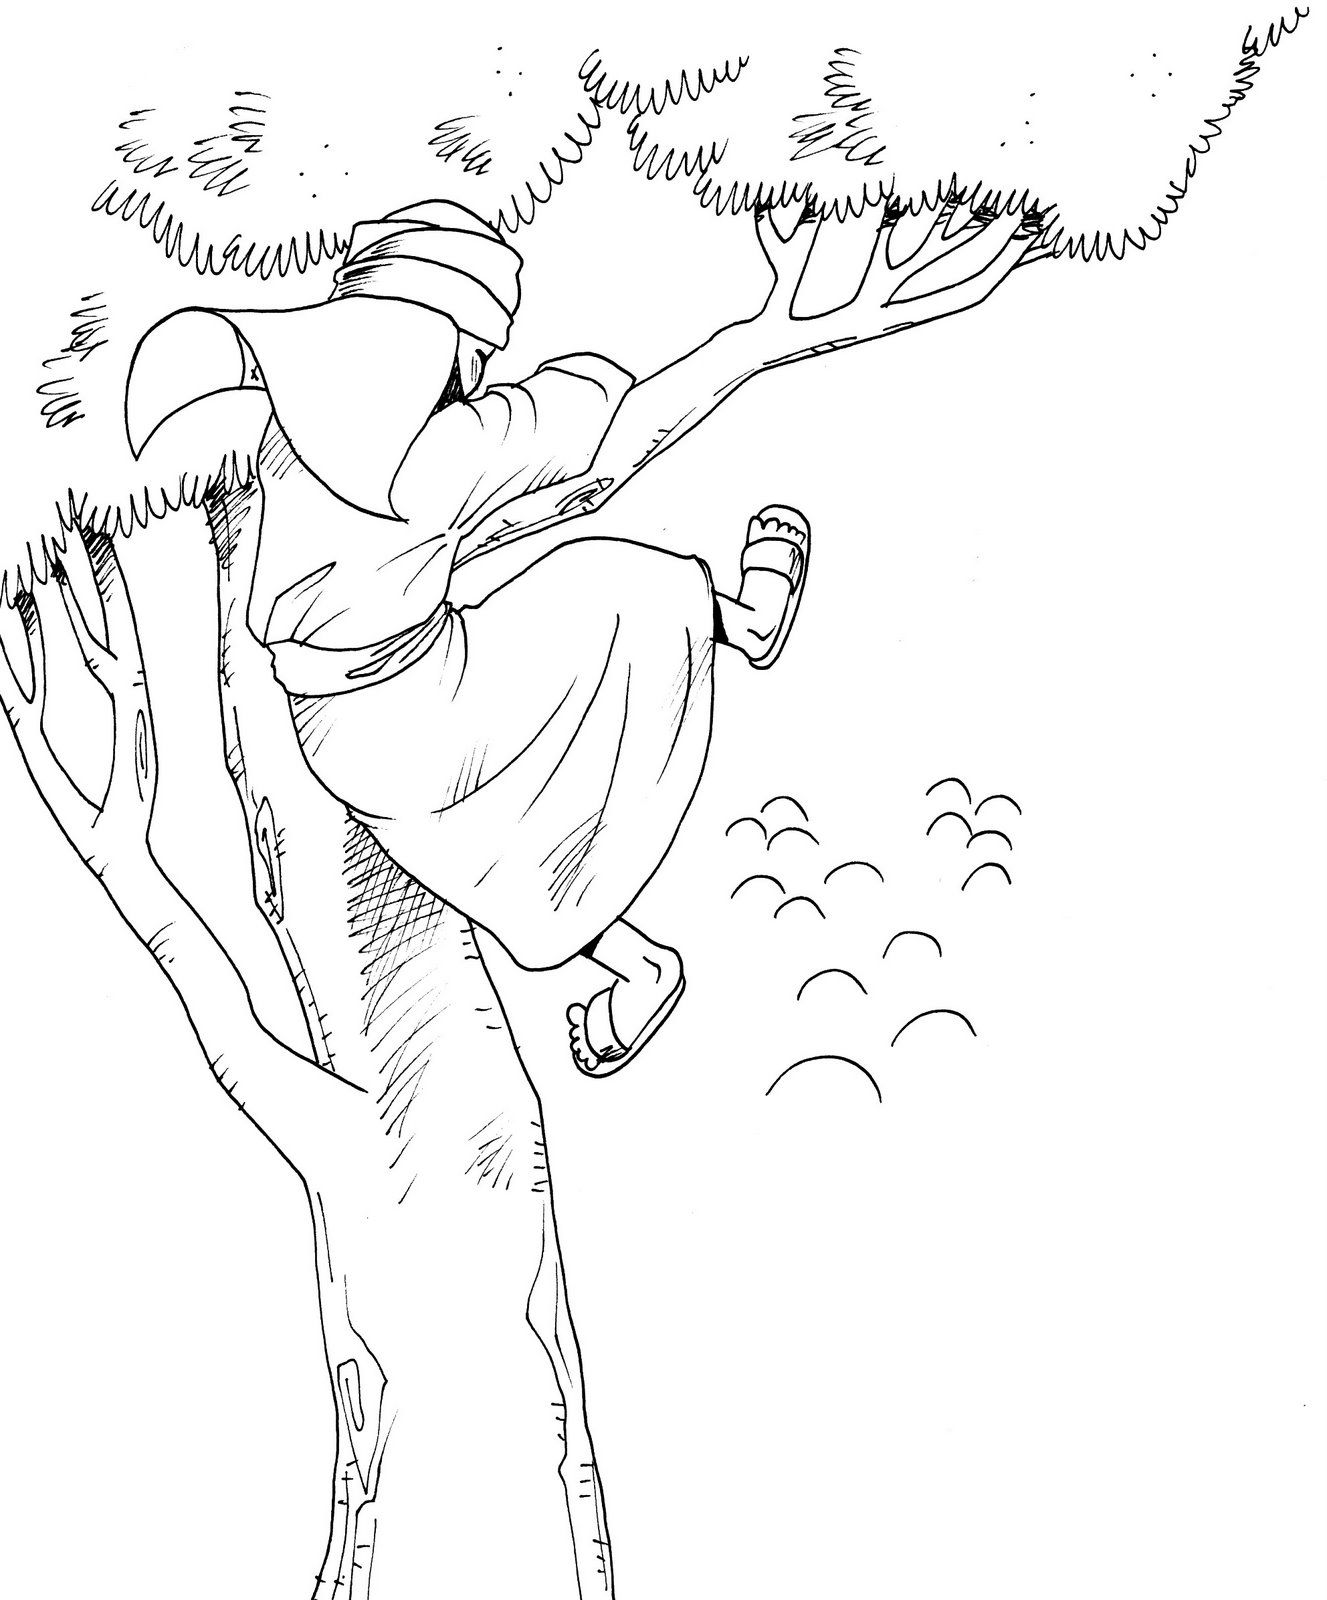 Zaqueo Zacchaeus Sunday School Coloring Pages Bible Coloring Pages [ 1600 x 1327 Pixel ]